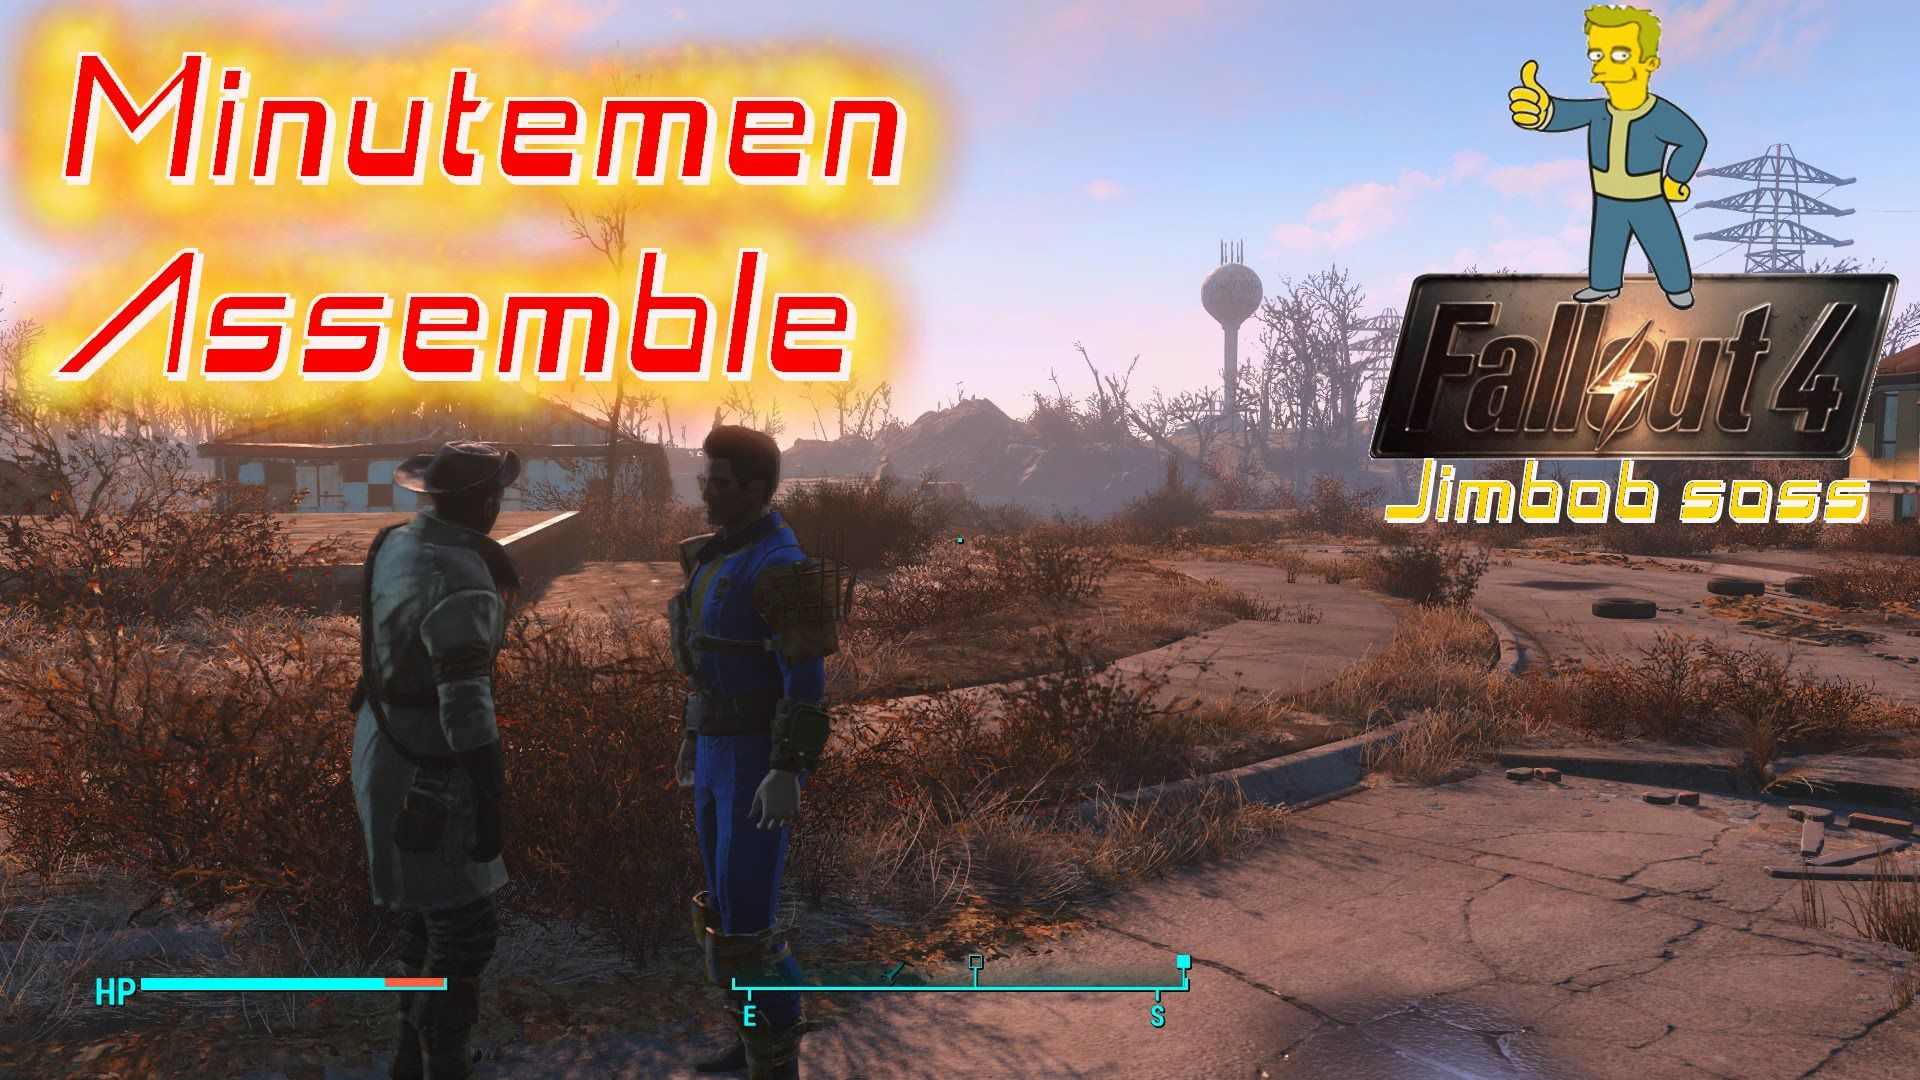 Fallout 4 EP 03 Minutemen Assemble